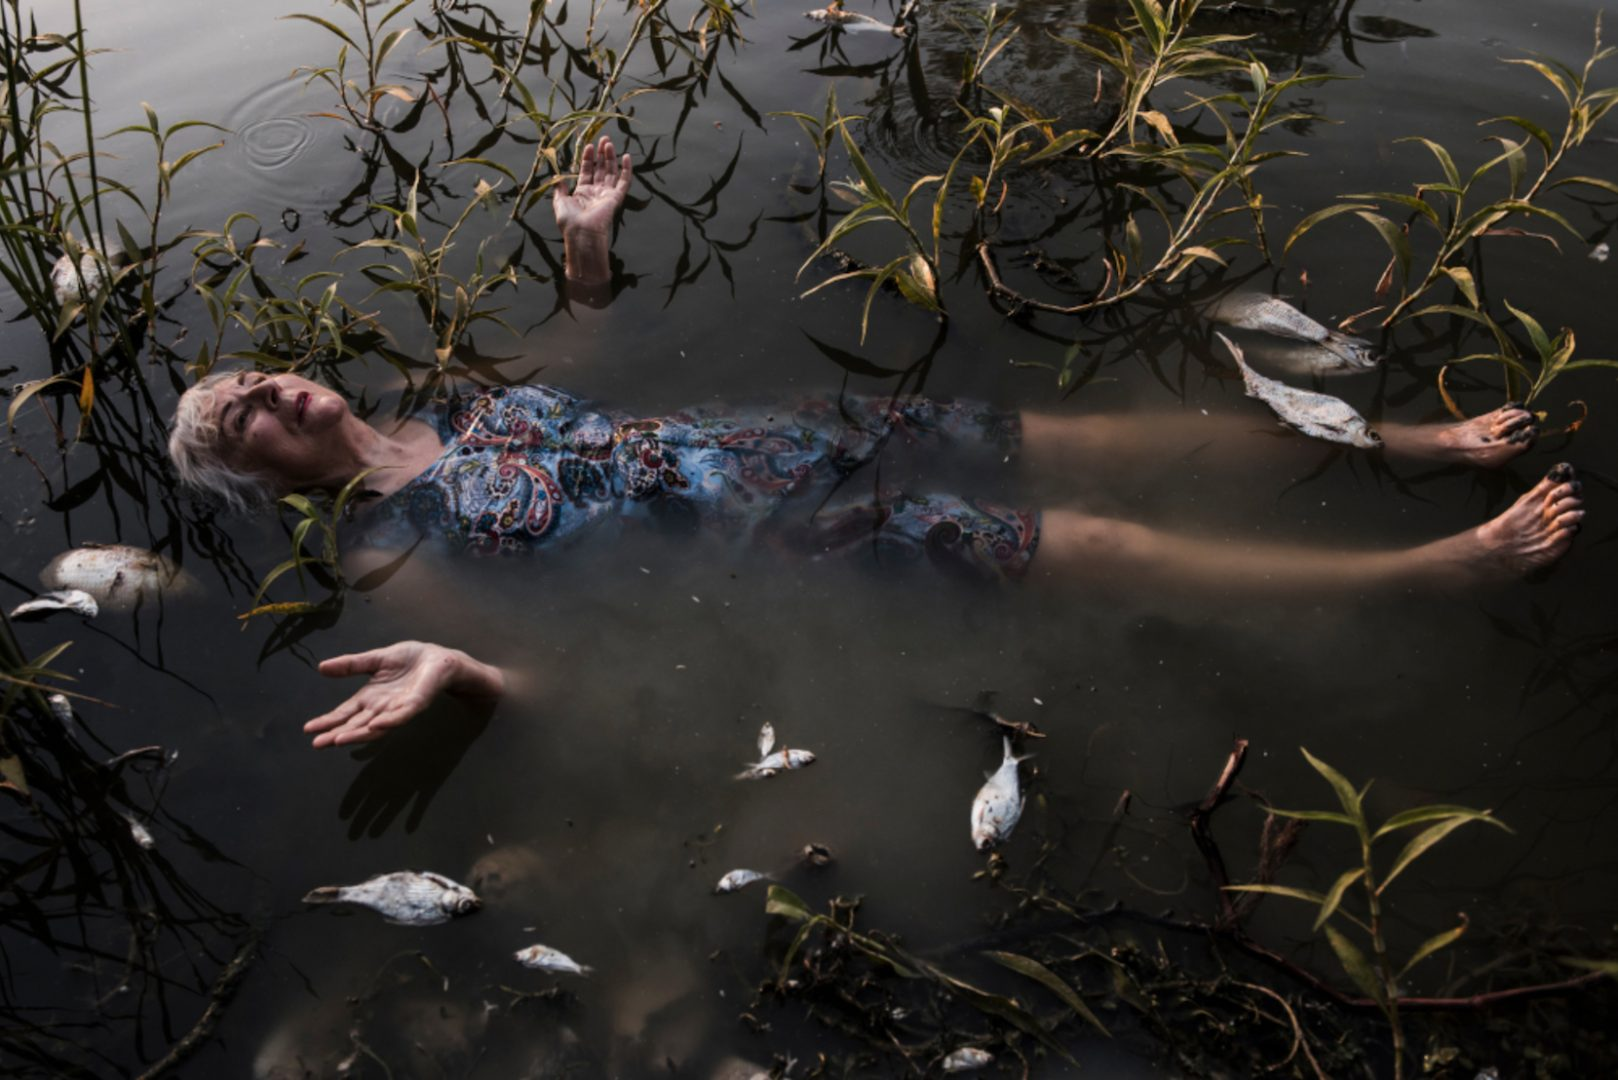 Photographic work of Australian artist Bonita Ely, responding to the mass fish die-off. | Menindee Fish Kill, January 2019, Artist: Bonita Ely; photographer: Melissa Williams-Brown